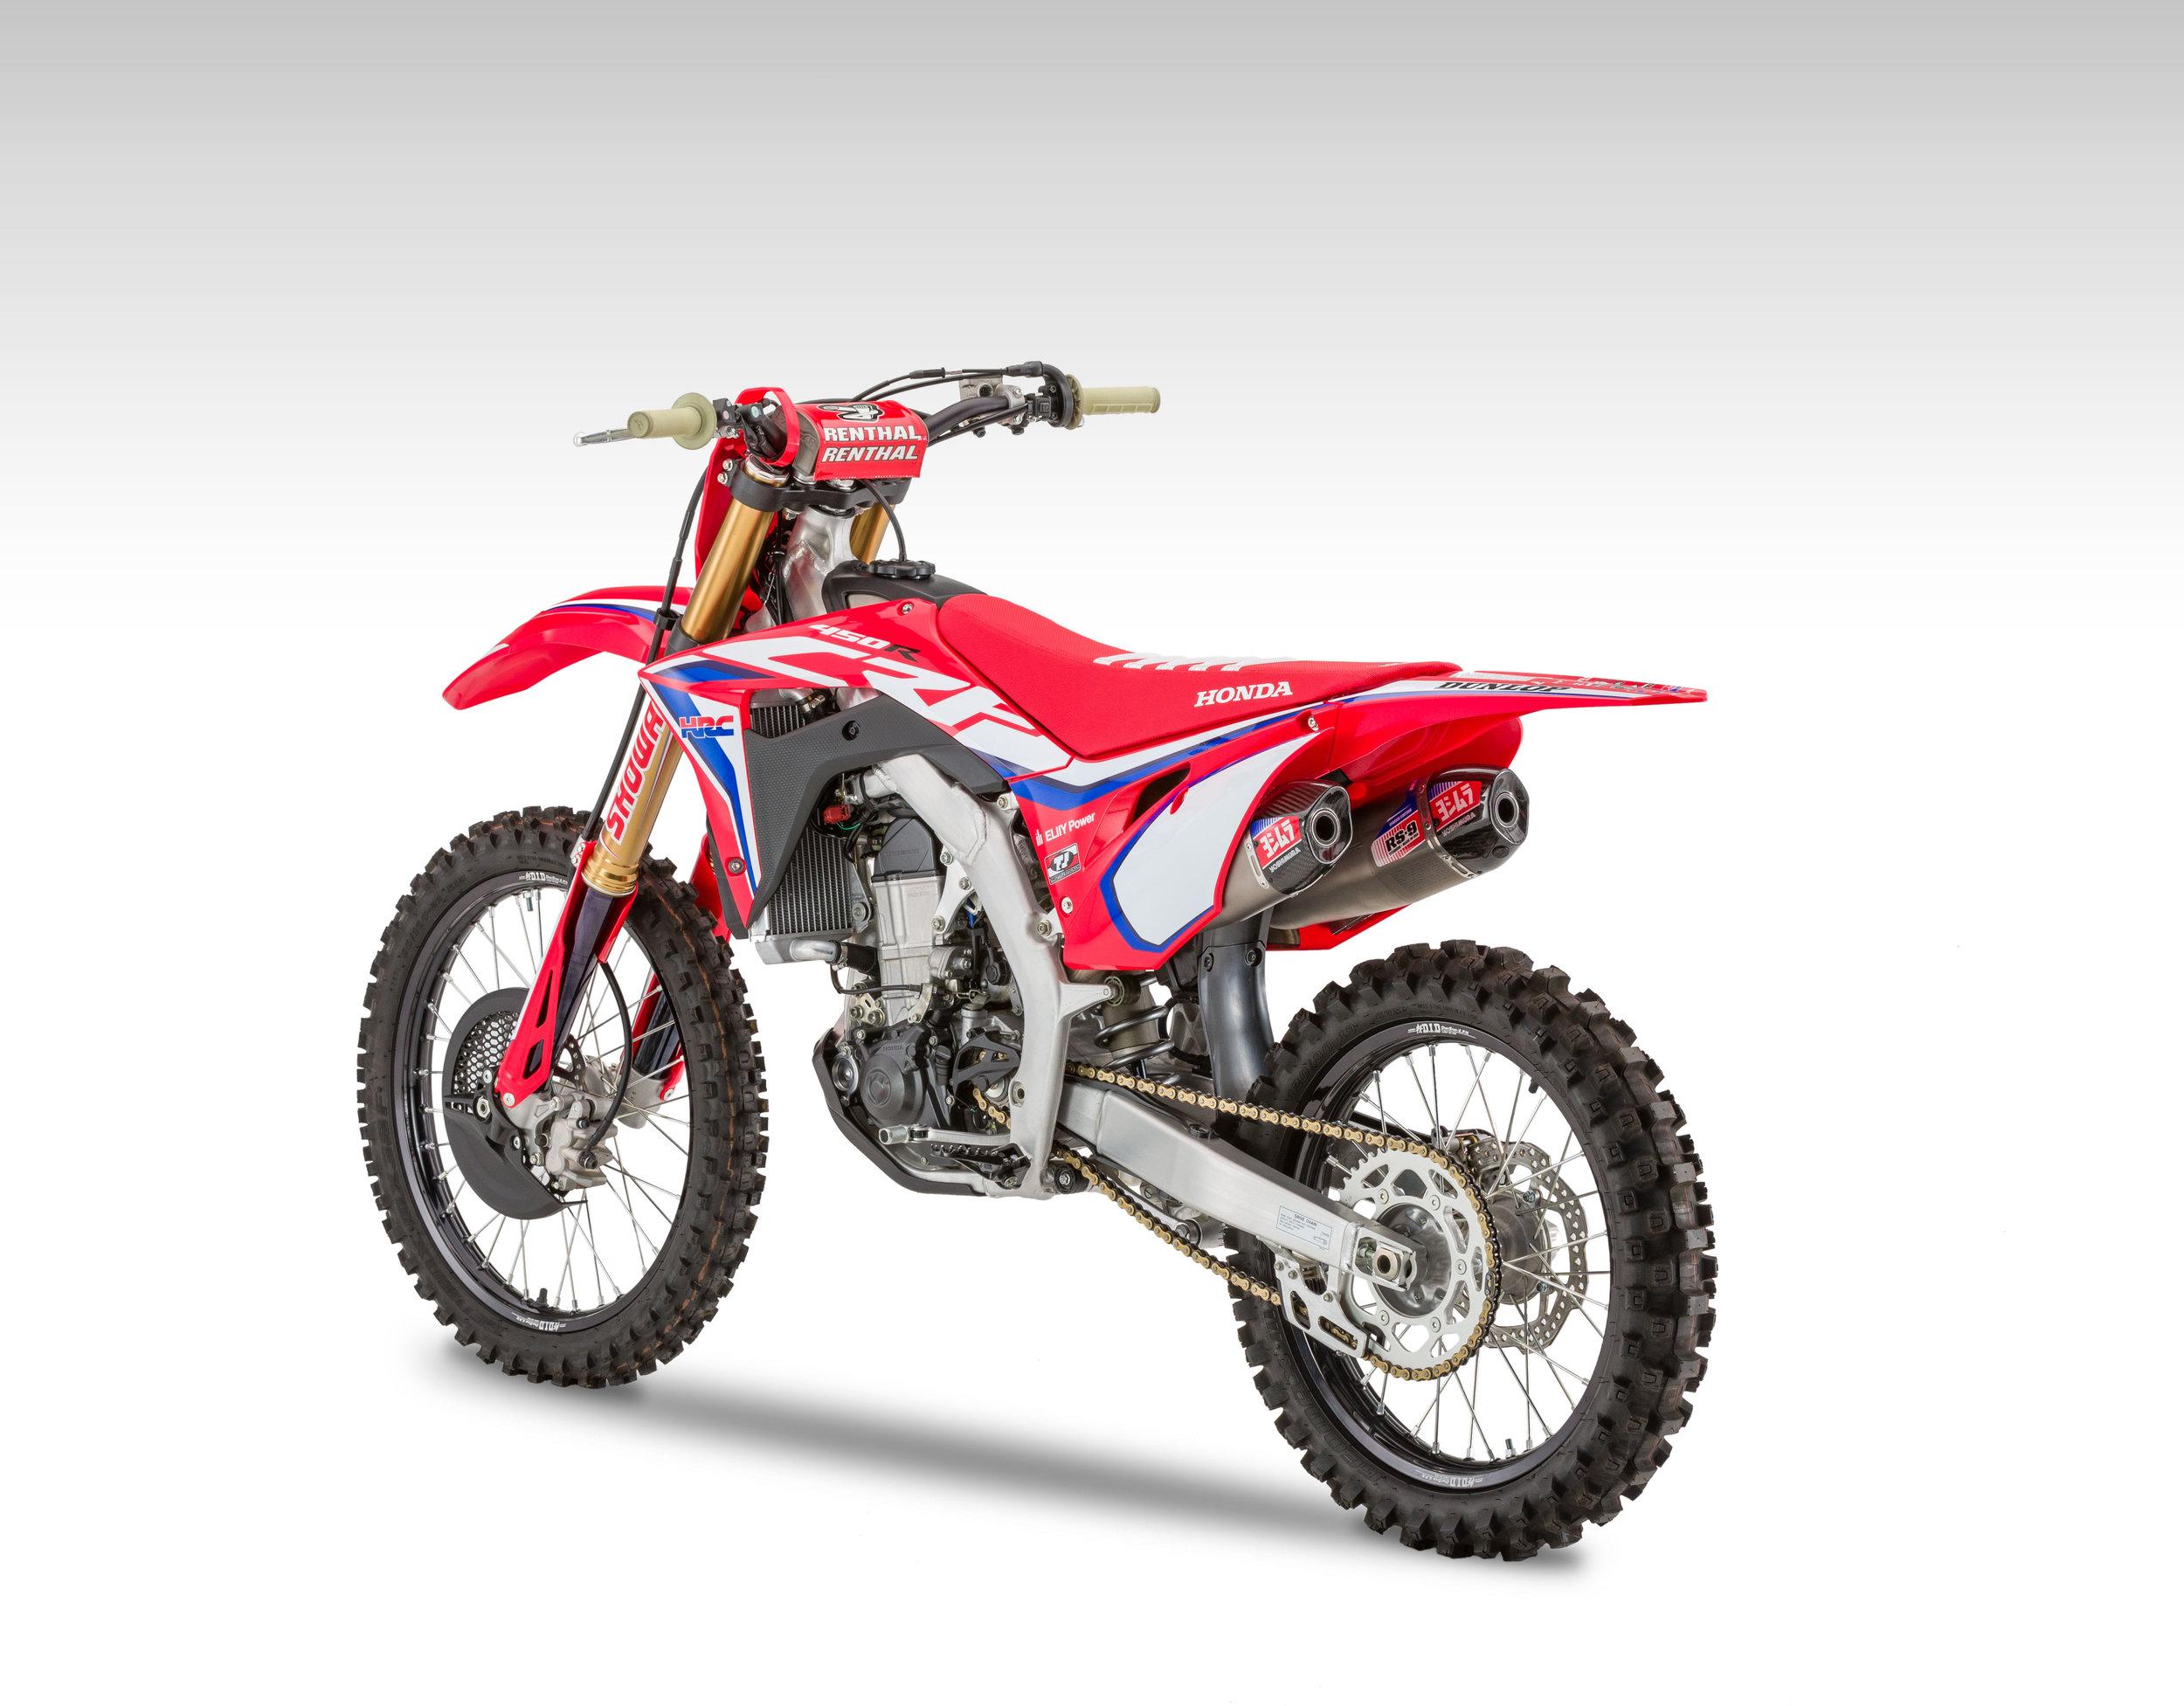 20_Honda_CRF450RWE_34LR.jpg